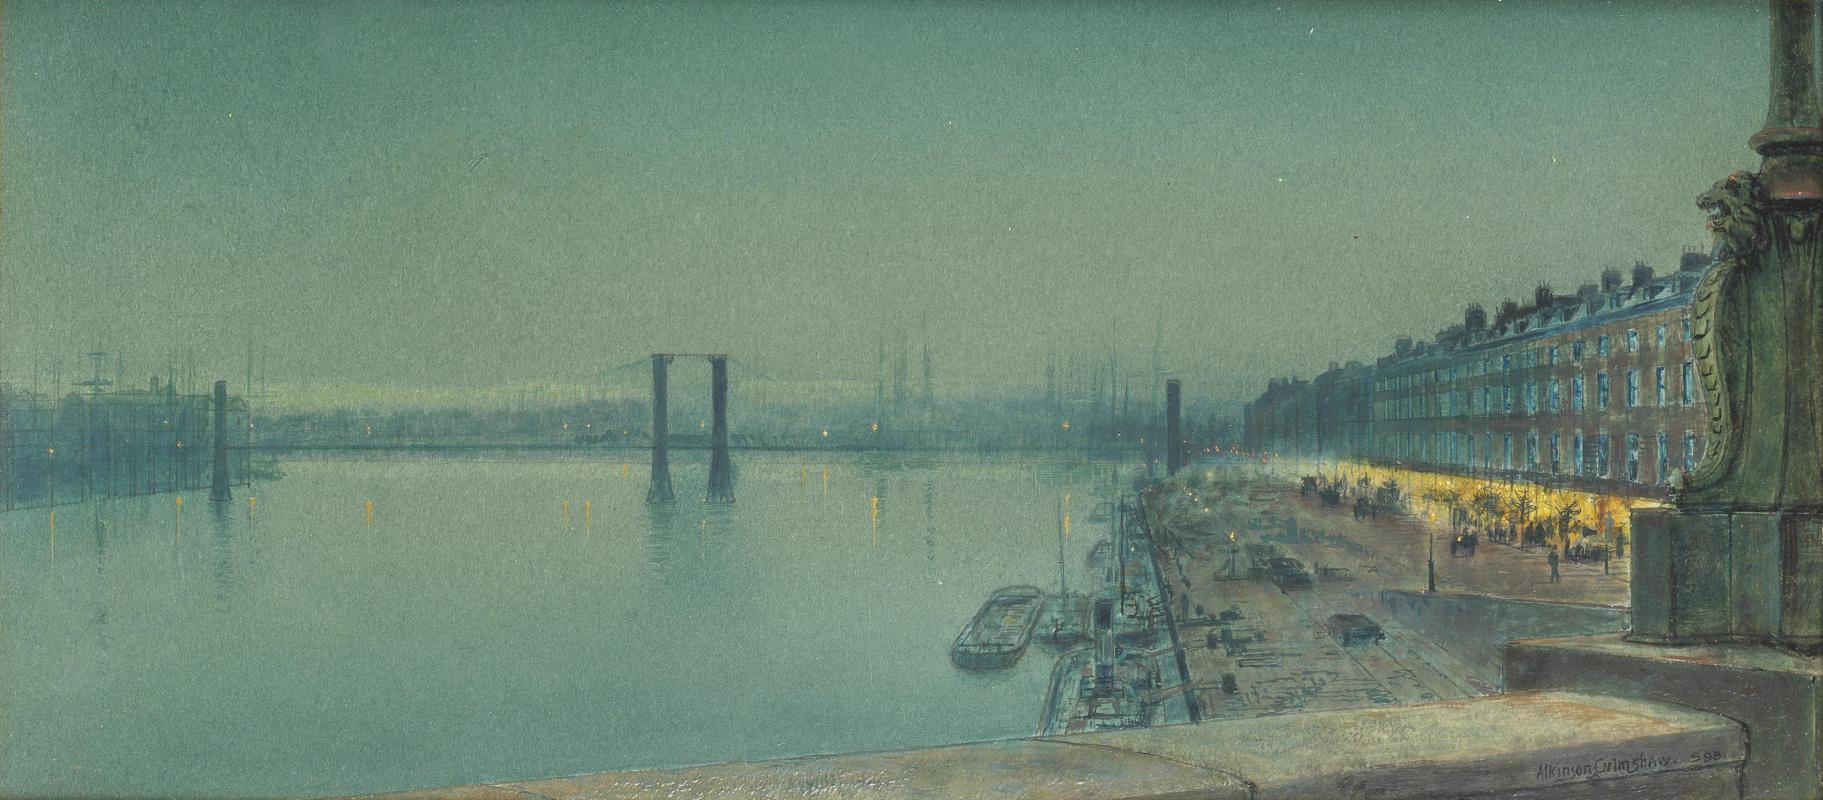 John Atkinson Grimshaw. Paris Embankment